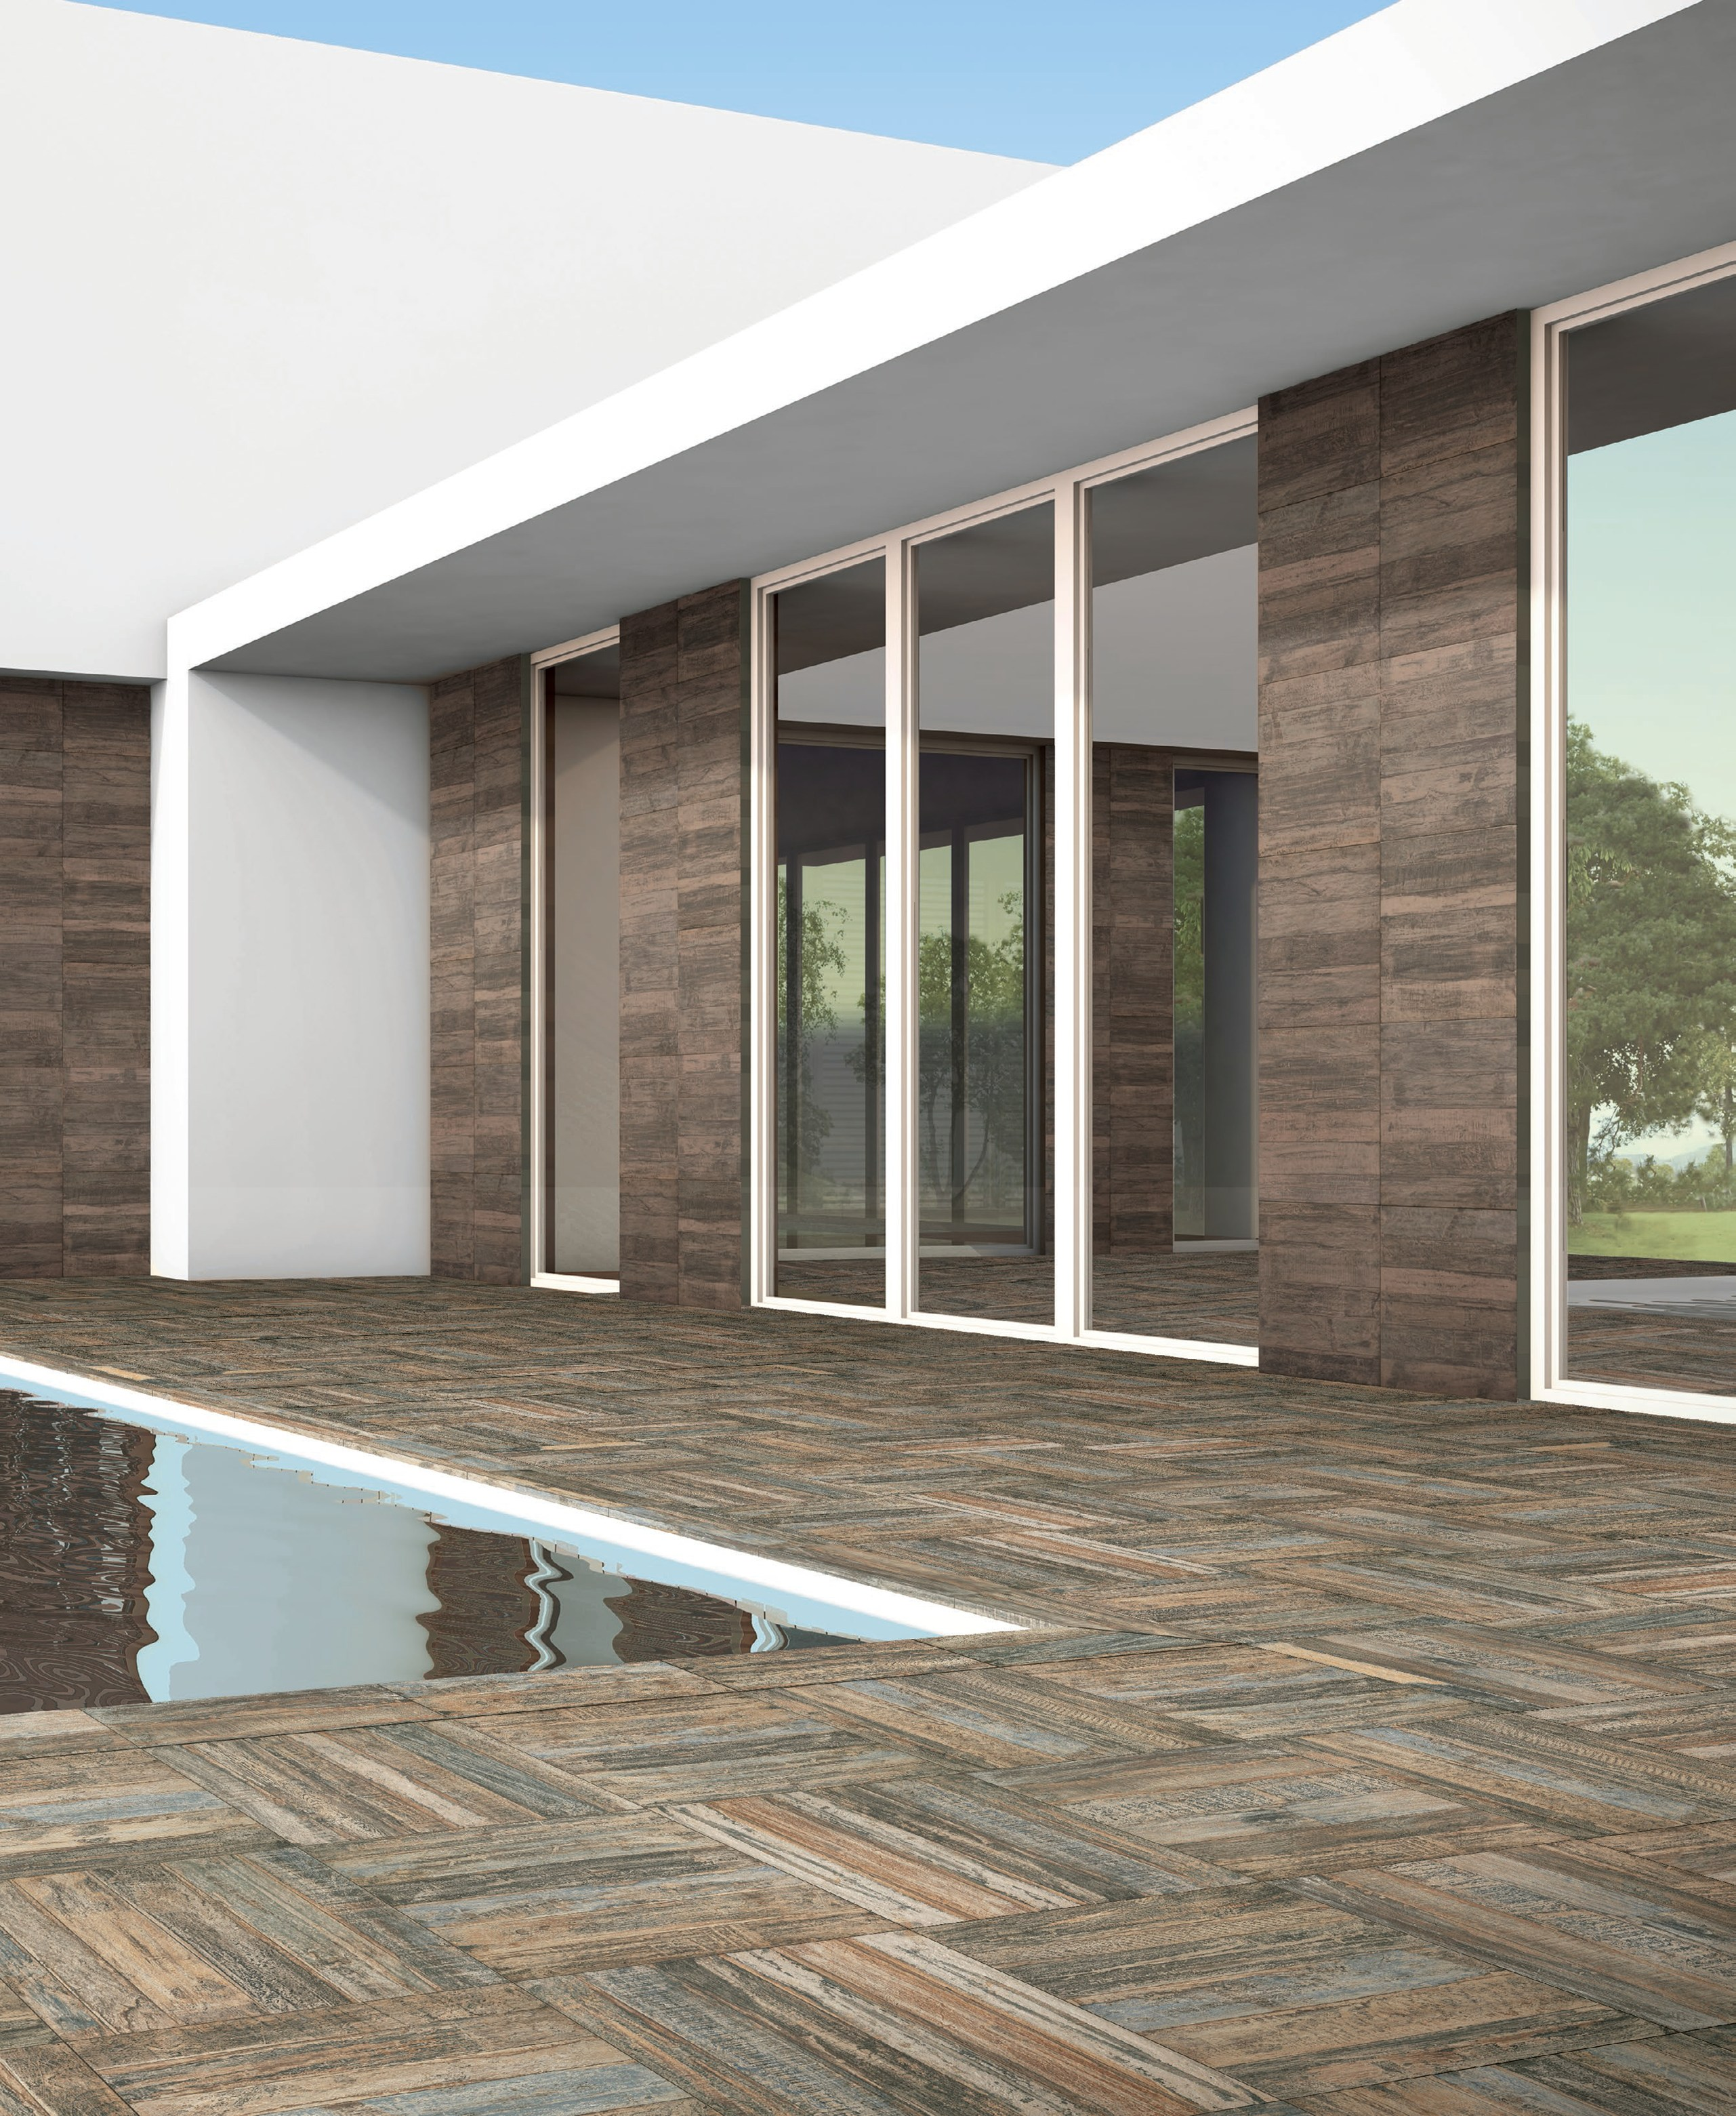 Baldosa de exterior elegant gallery of suelo de baldosas for Baldosas decorativas